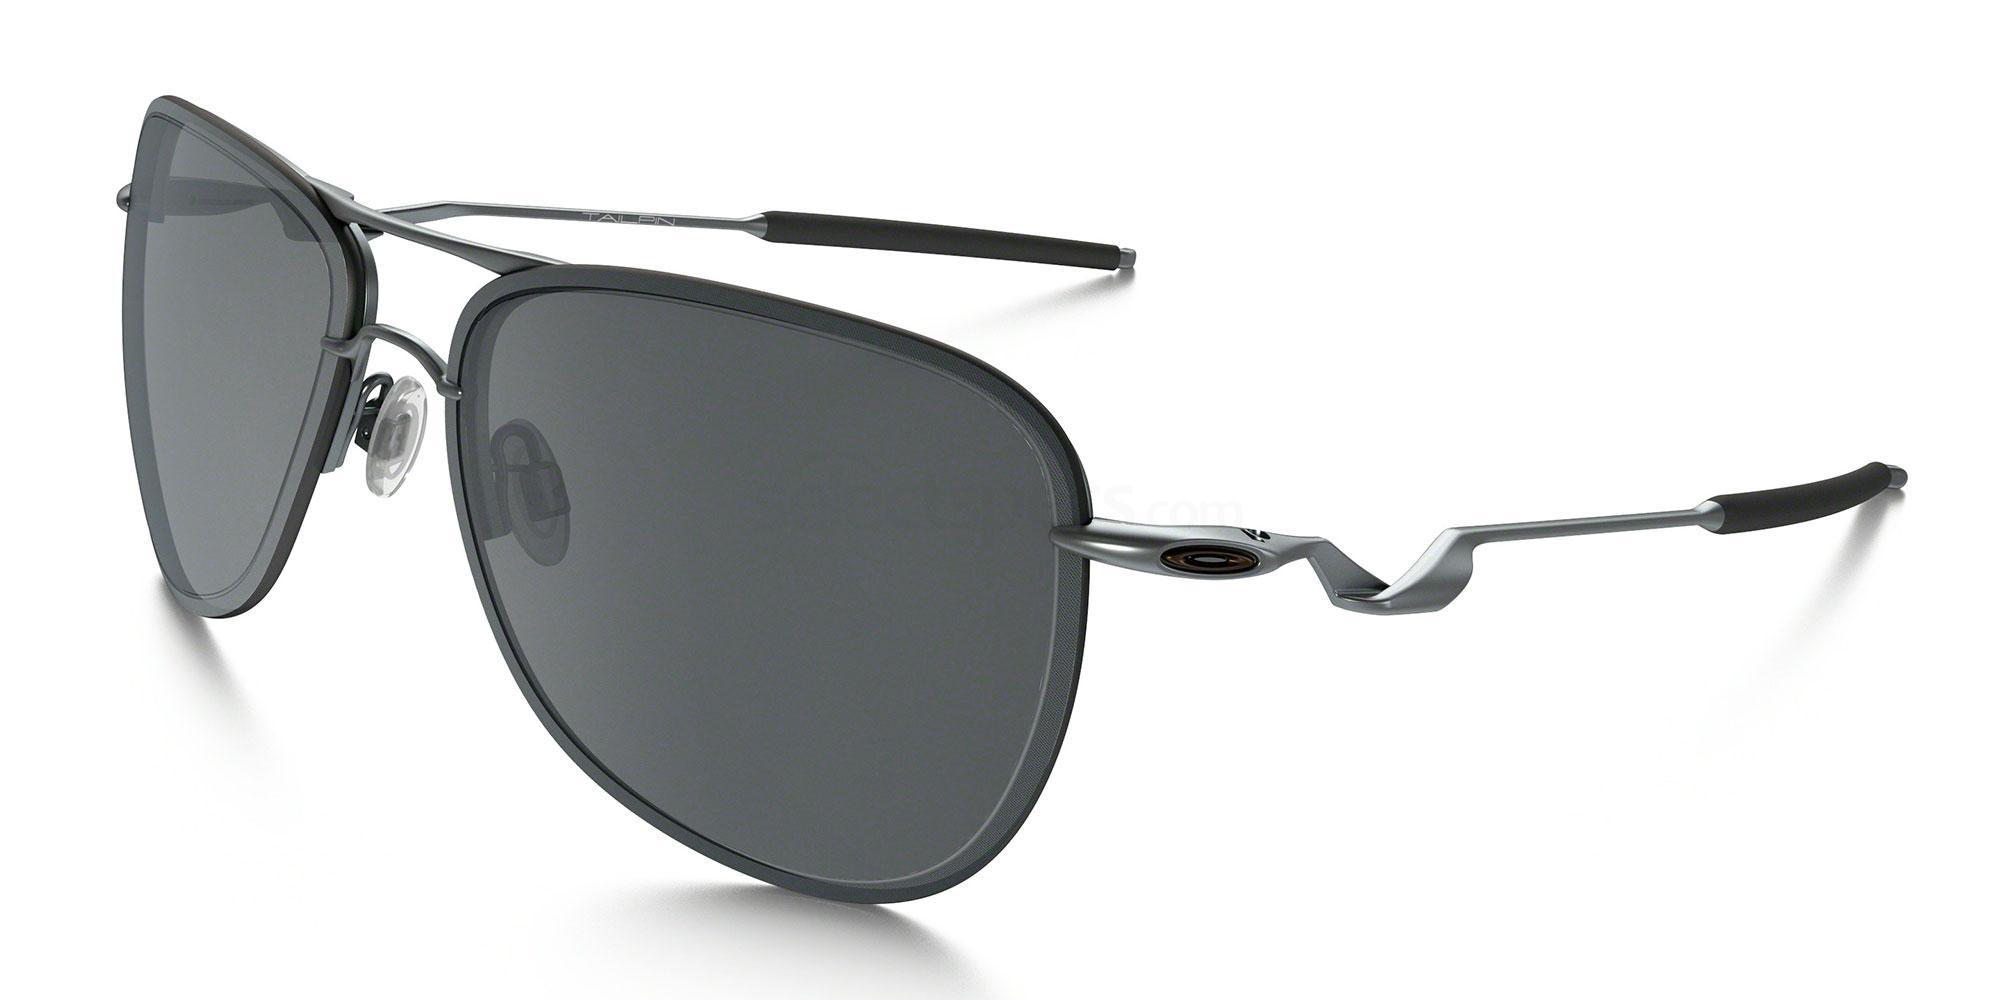 408601 OO4086 TAILPIN Sunglasses, Oakley